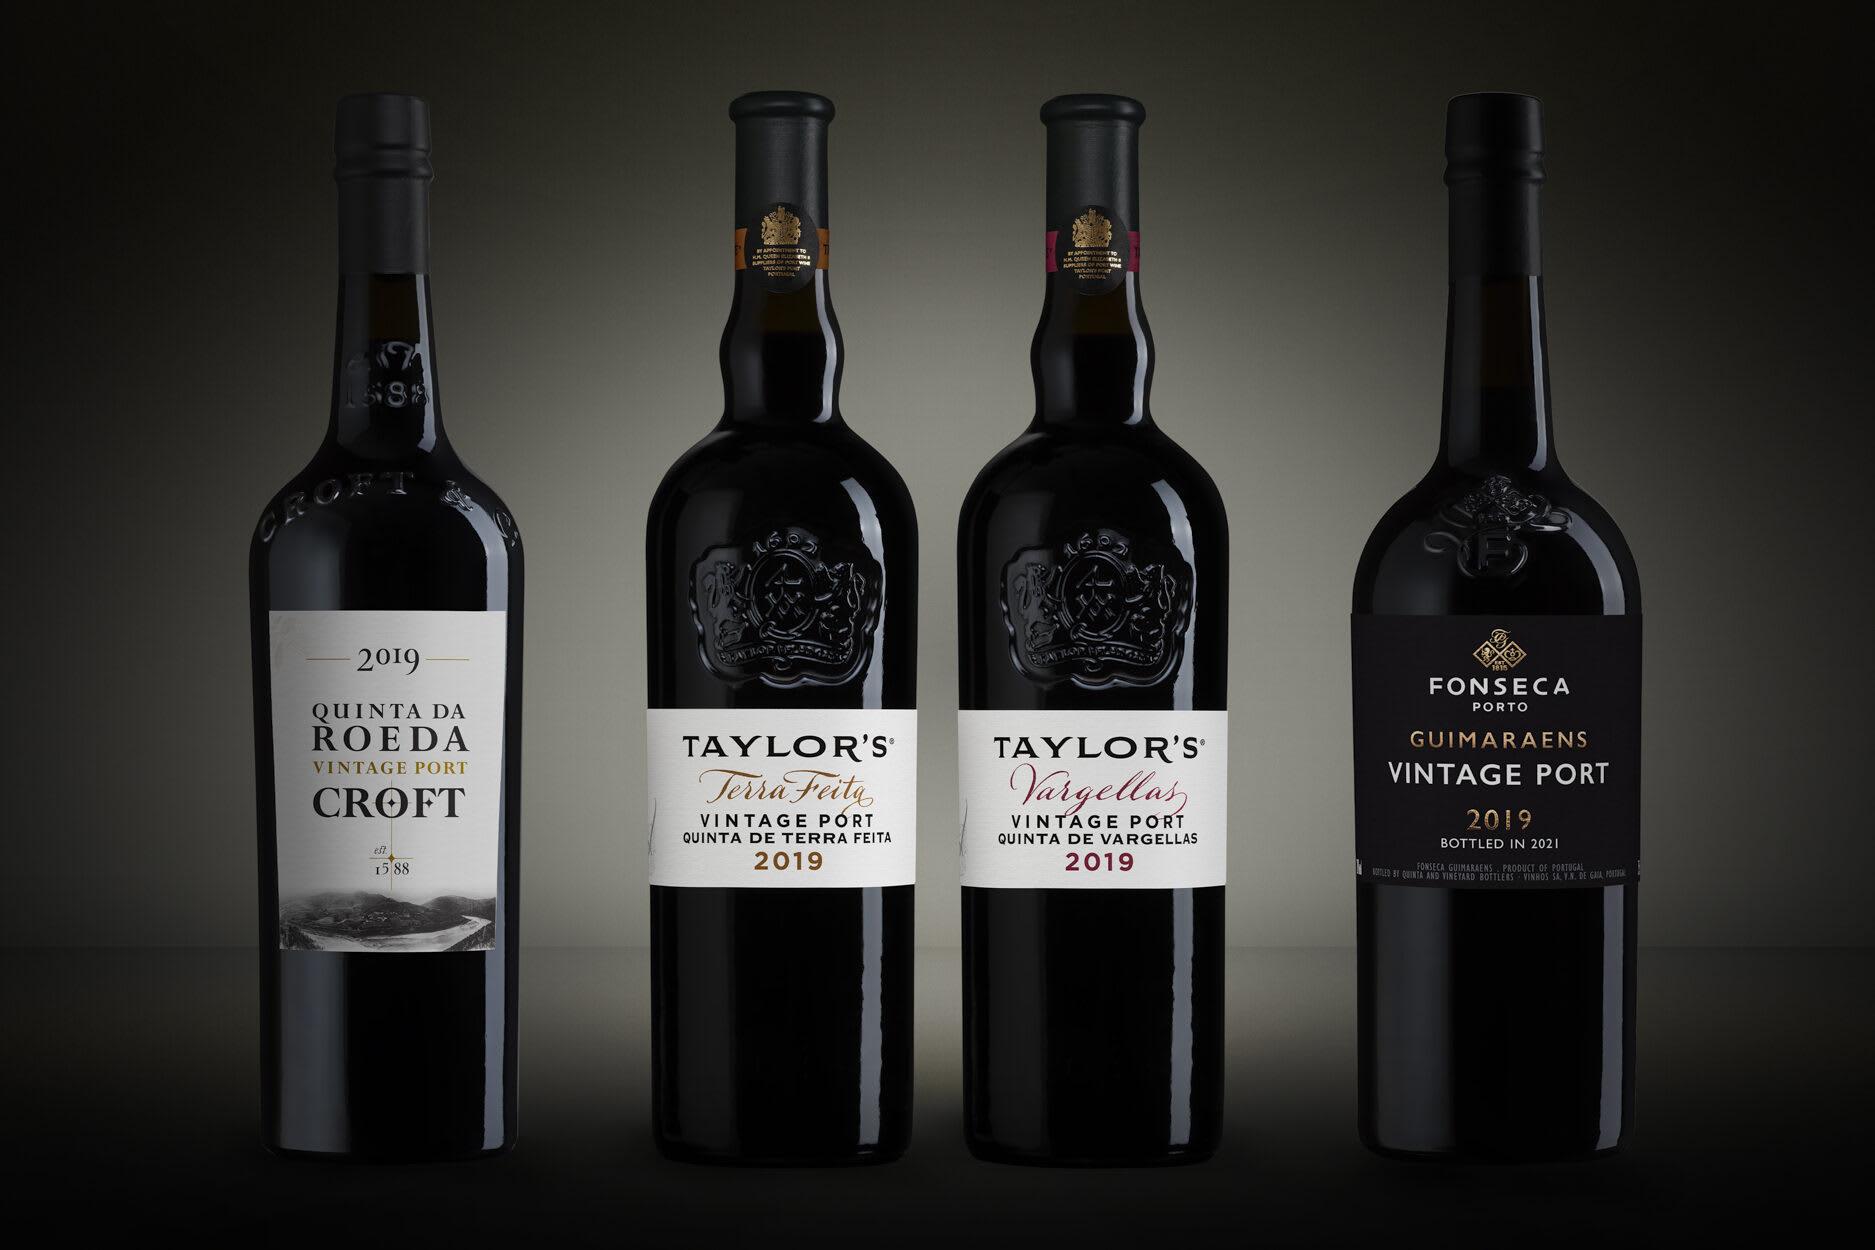 Fladgate Partnership: Taylor's, Croft, Fonseca